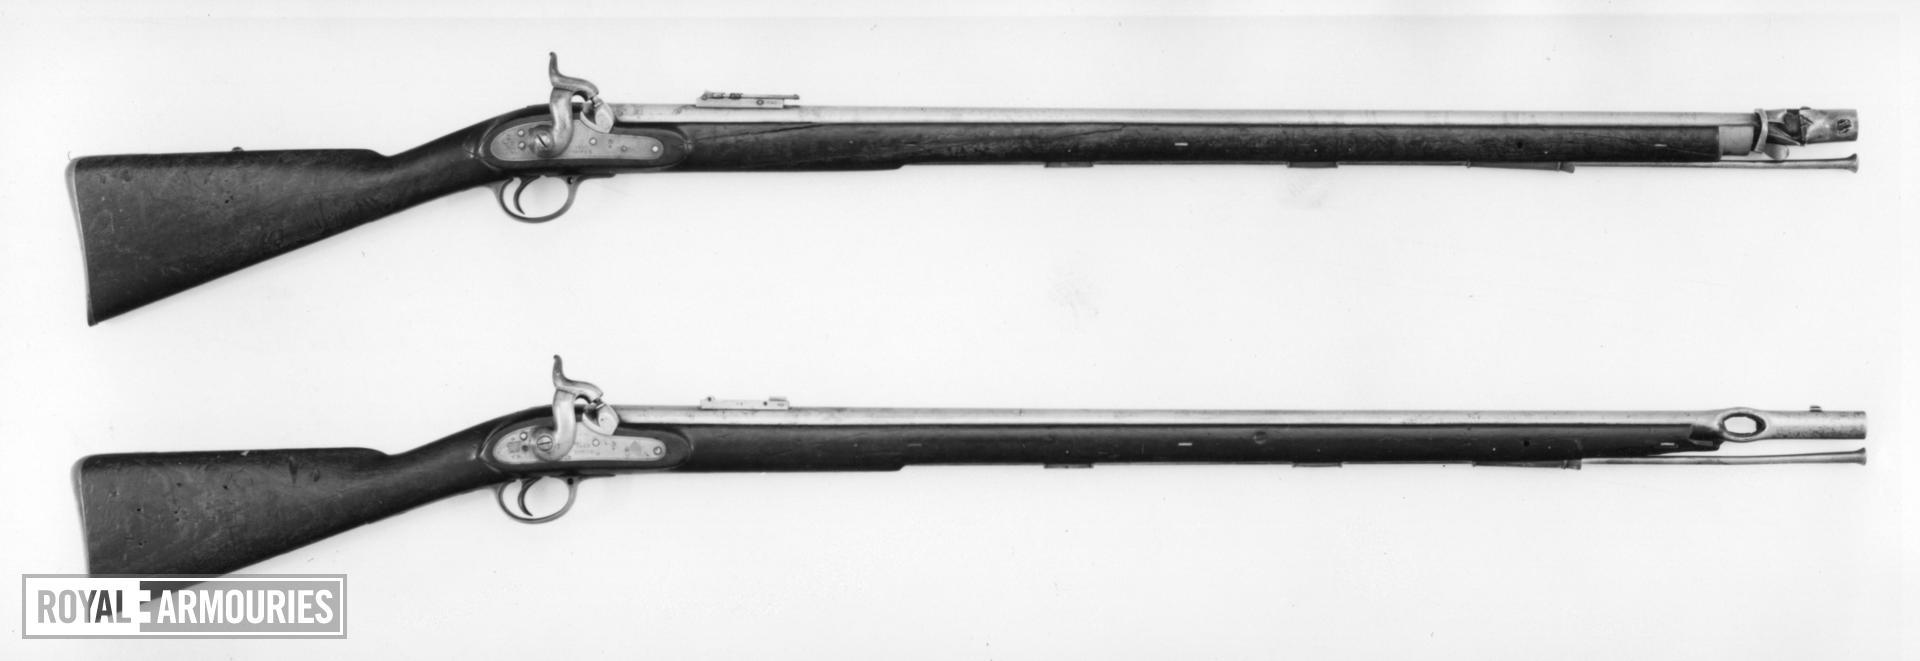 Percussion muzzle-loading military rifle-musket - Minie Pattern 1851